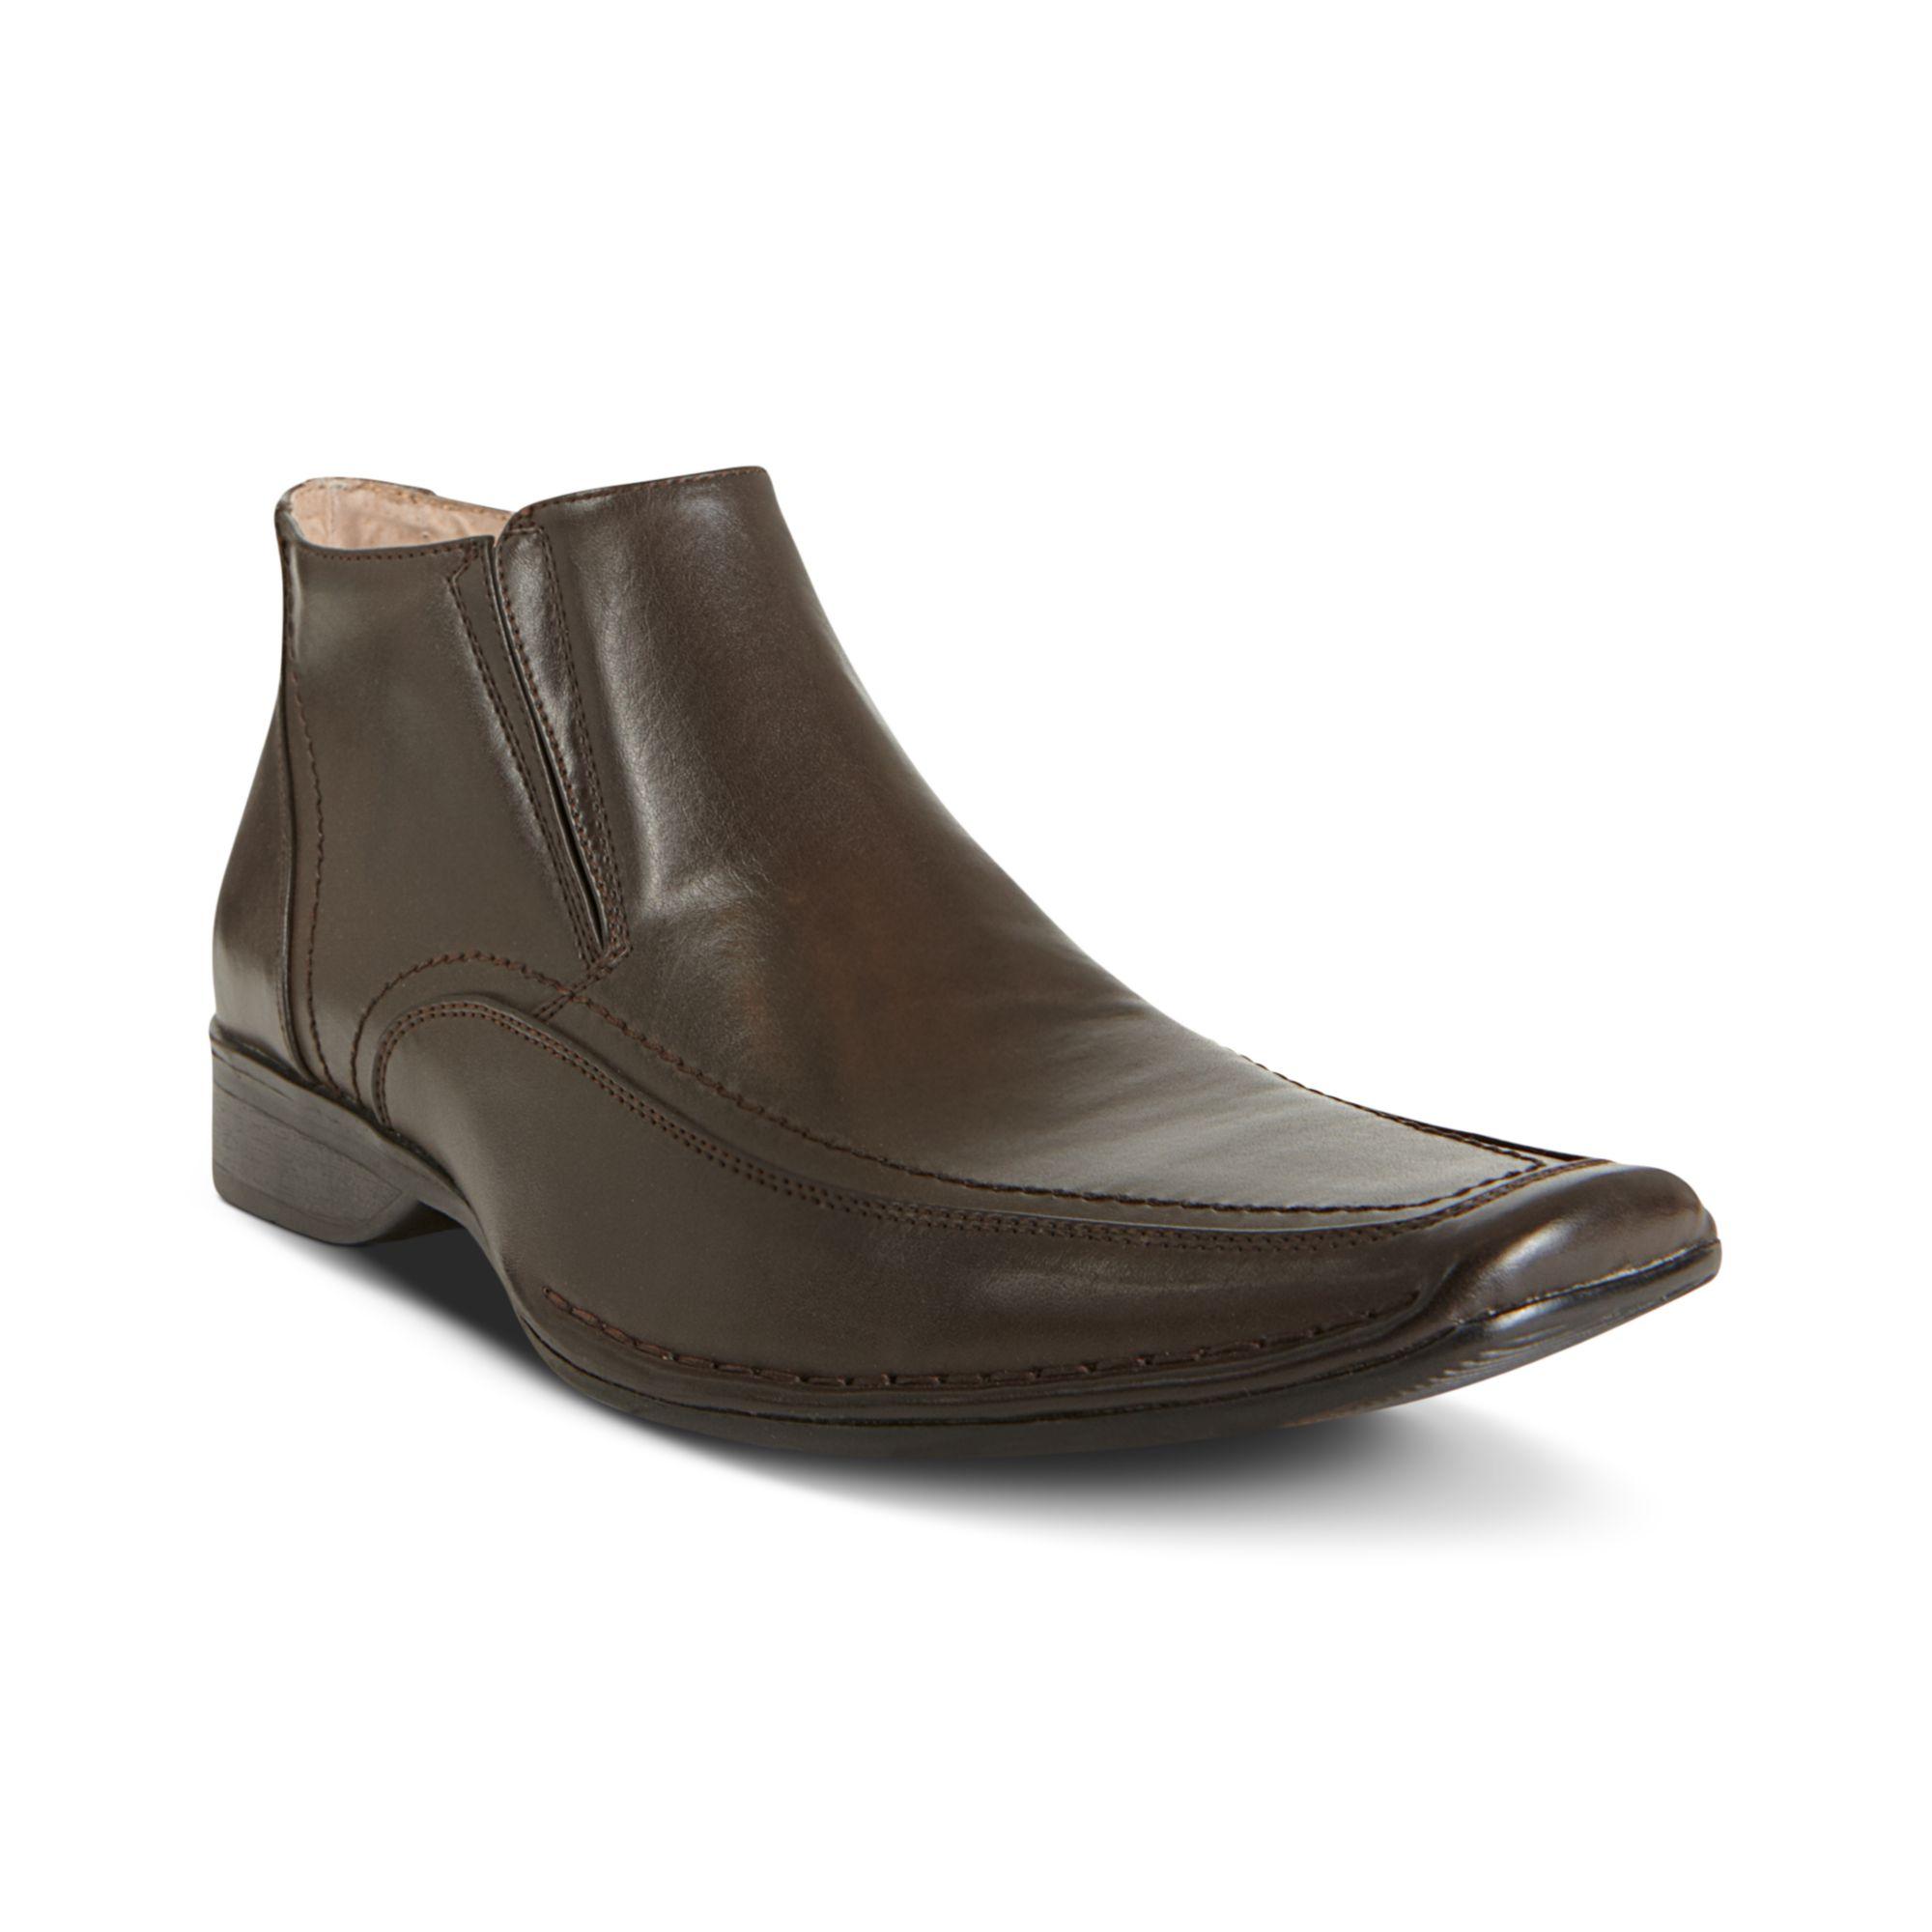 steve madden rhode chukka boots in brown for men lyst. Black Bedroom Furniture Sets. Home Design Ideas